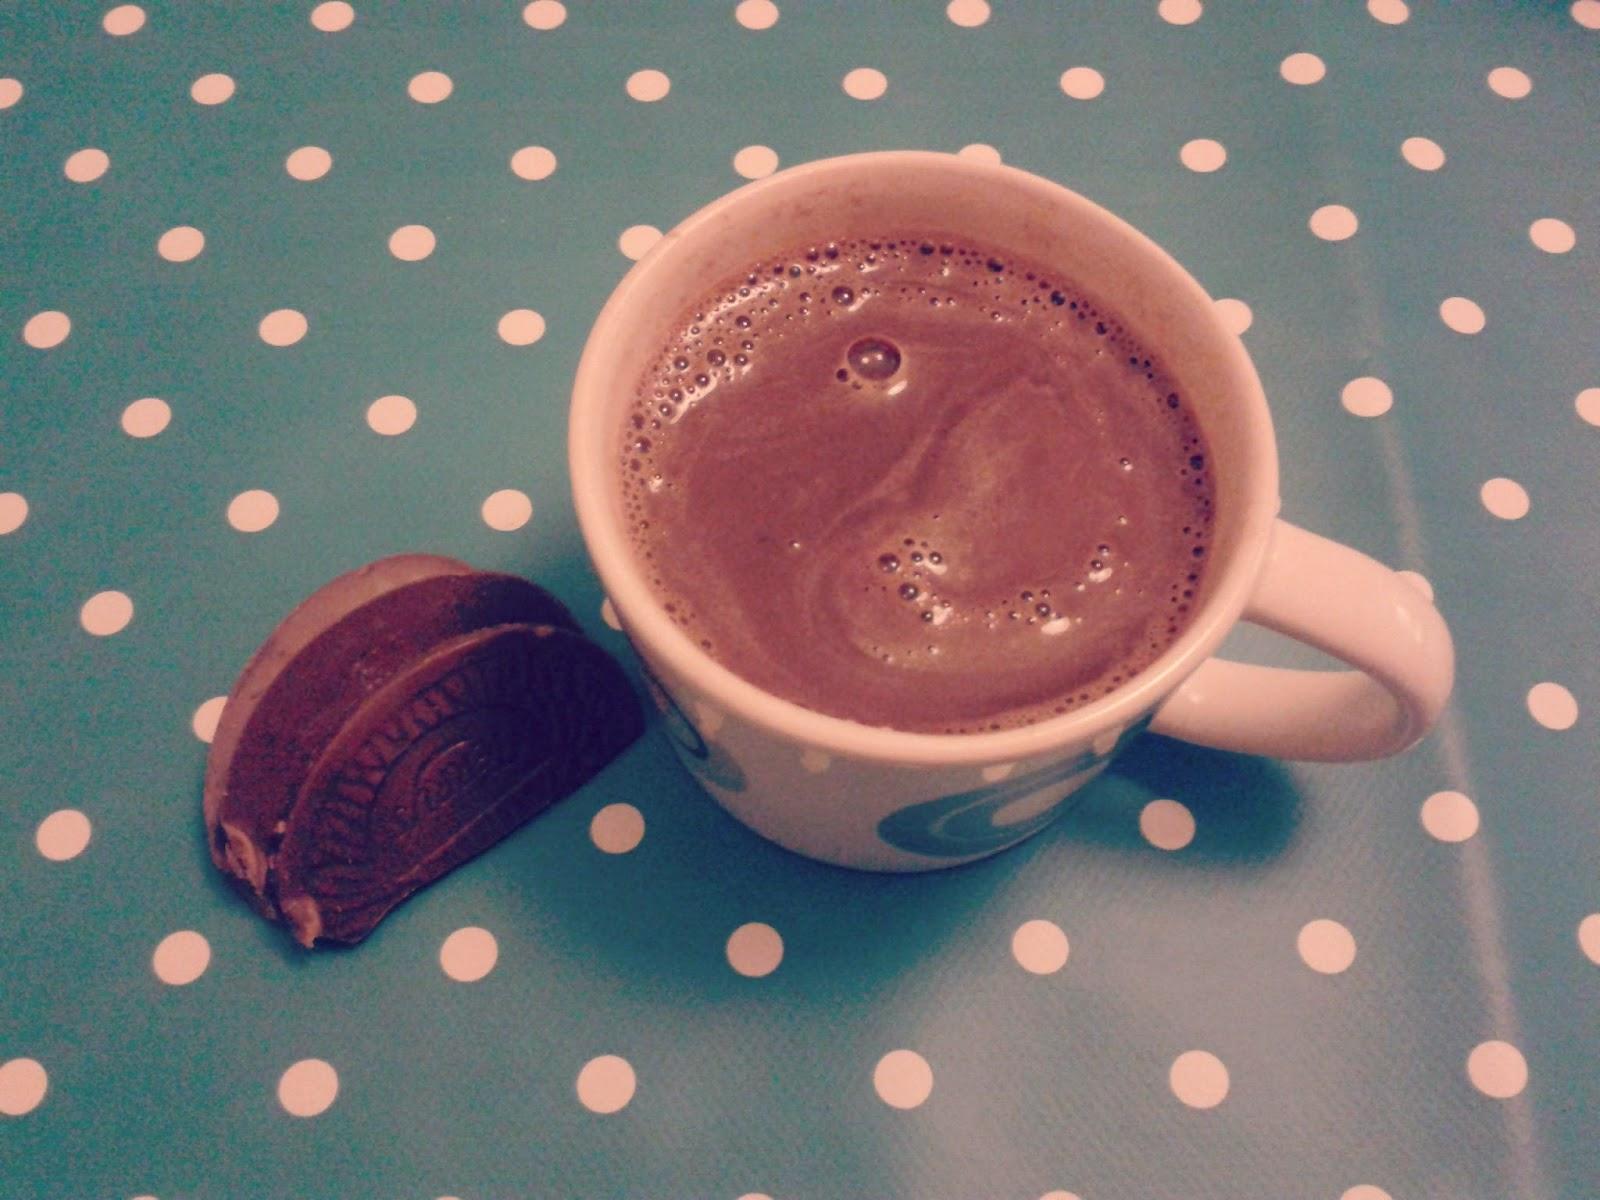 Project 365 day 356 - Chocolate Orange Hot Chocolate // 76sunflowers